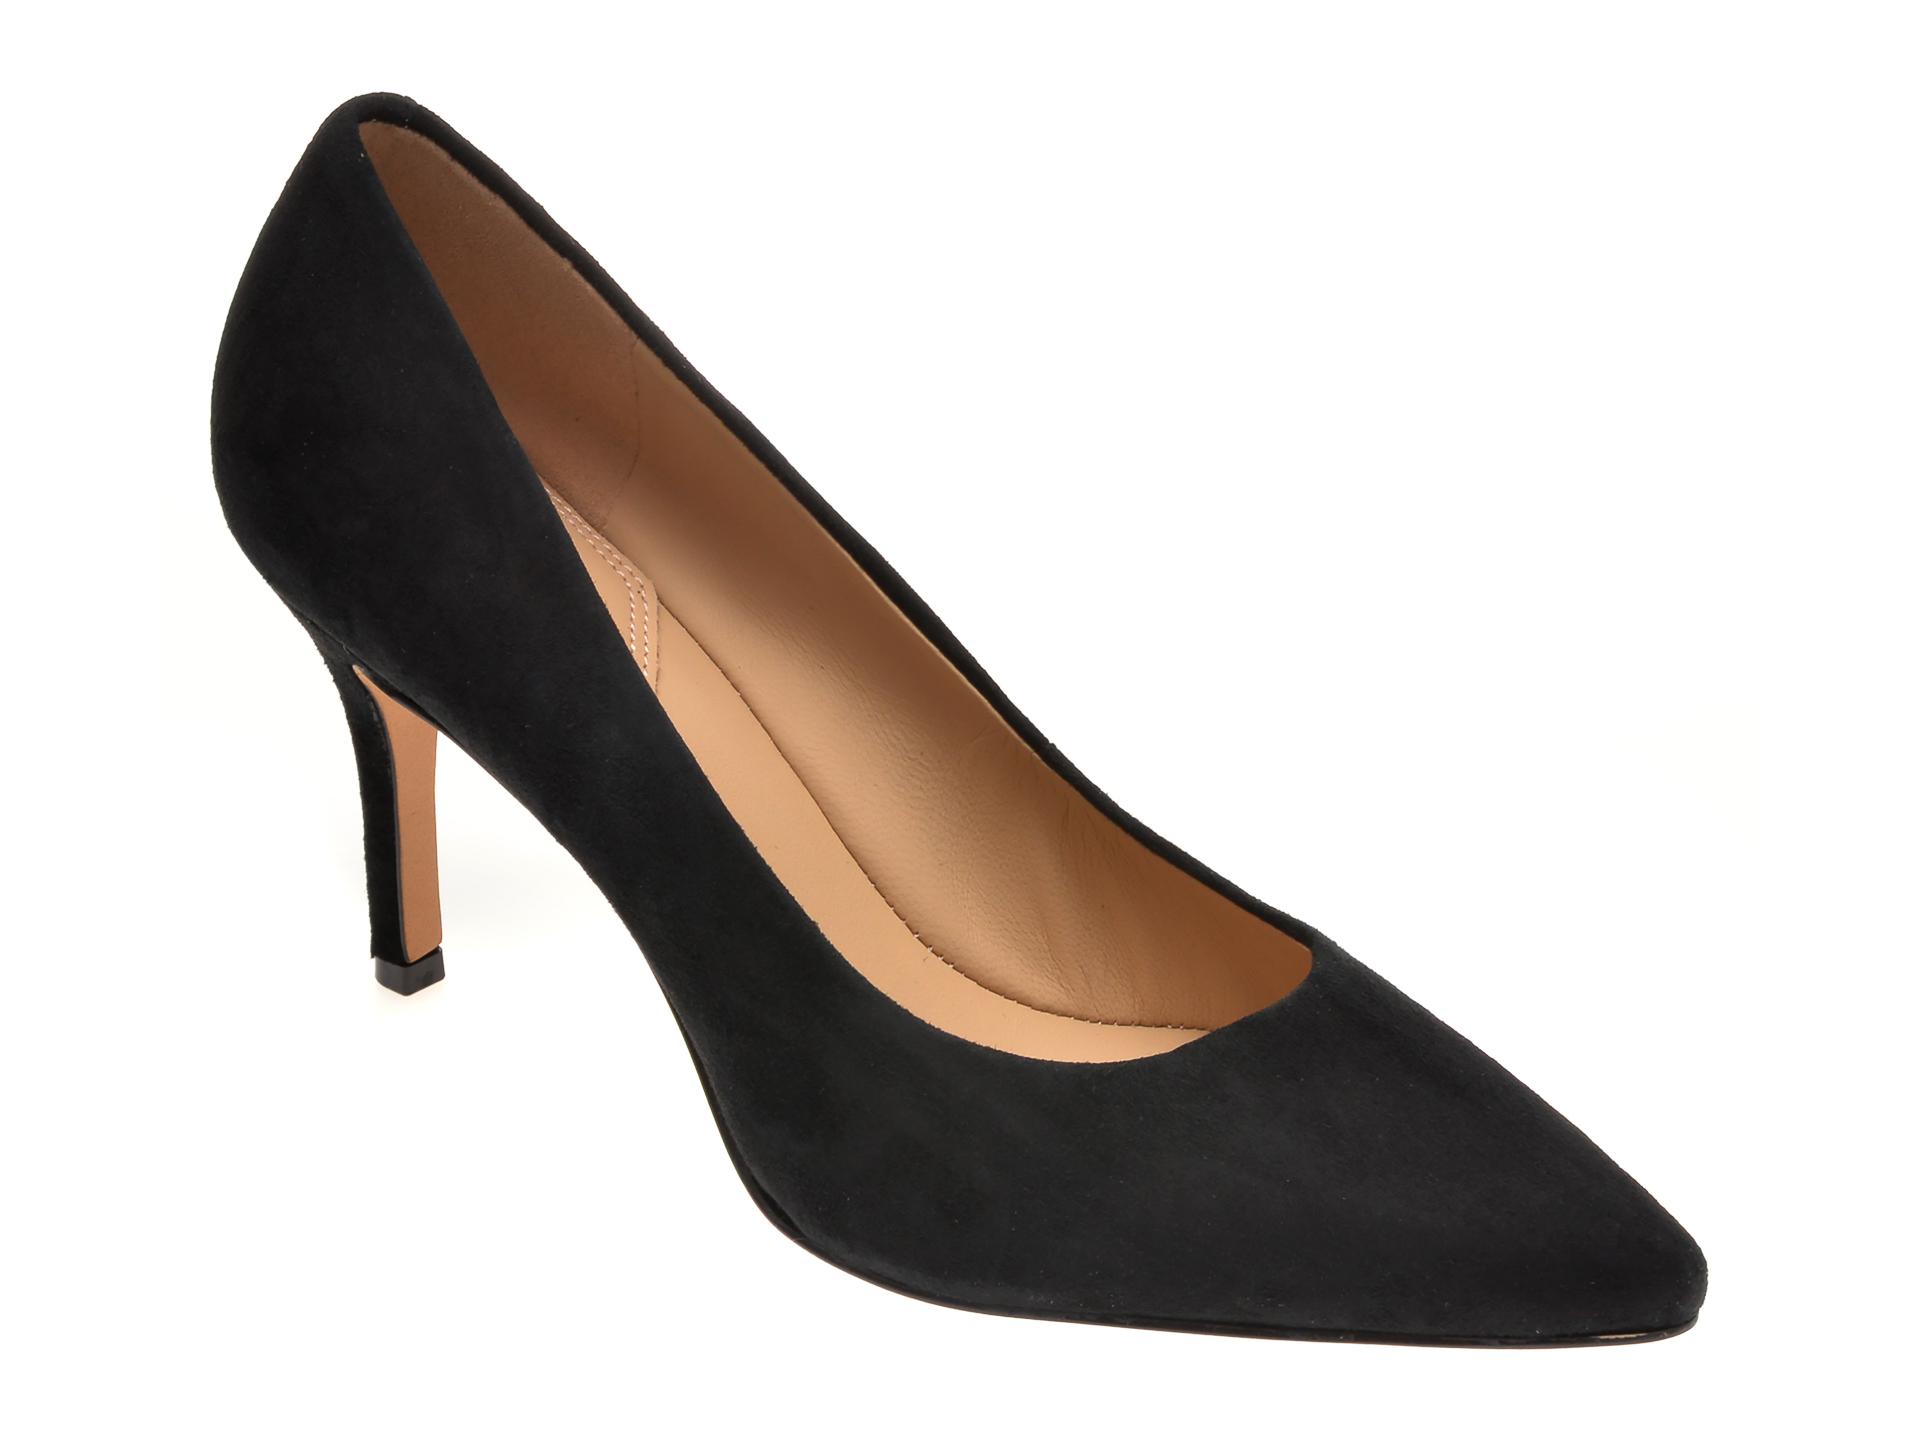 Pantofi ALDO negri, Coronitiflex001, din piele intoarsa imagine otter.ro